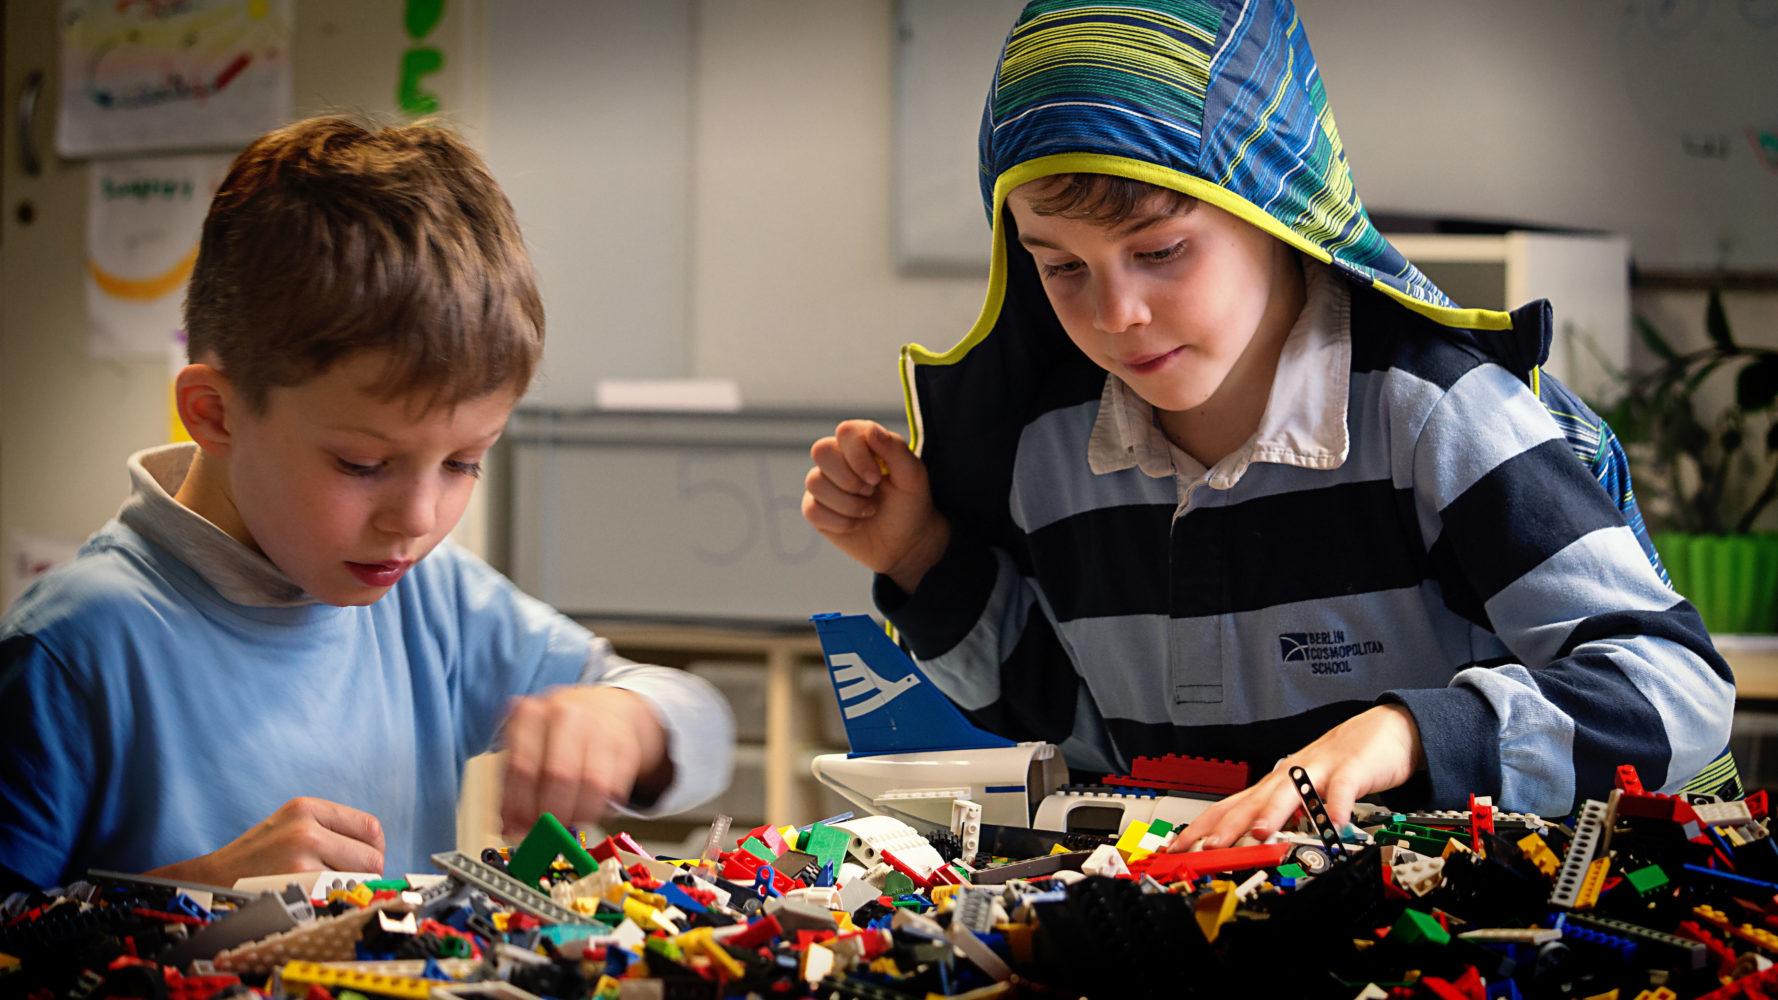 Lego Club_Extracurricular Programme_Berlin Cosmopolitan School